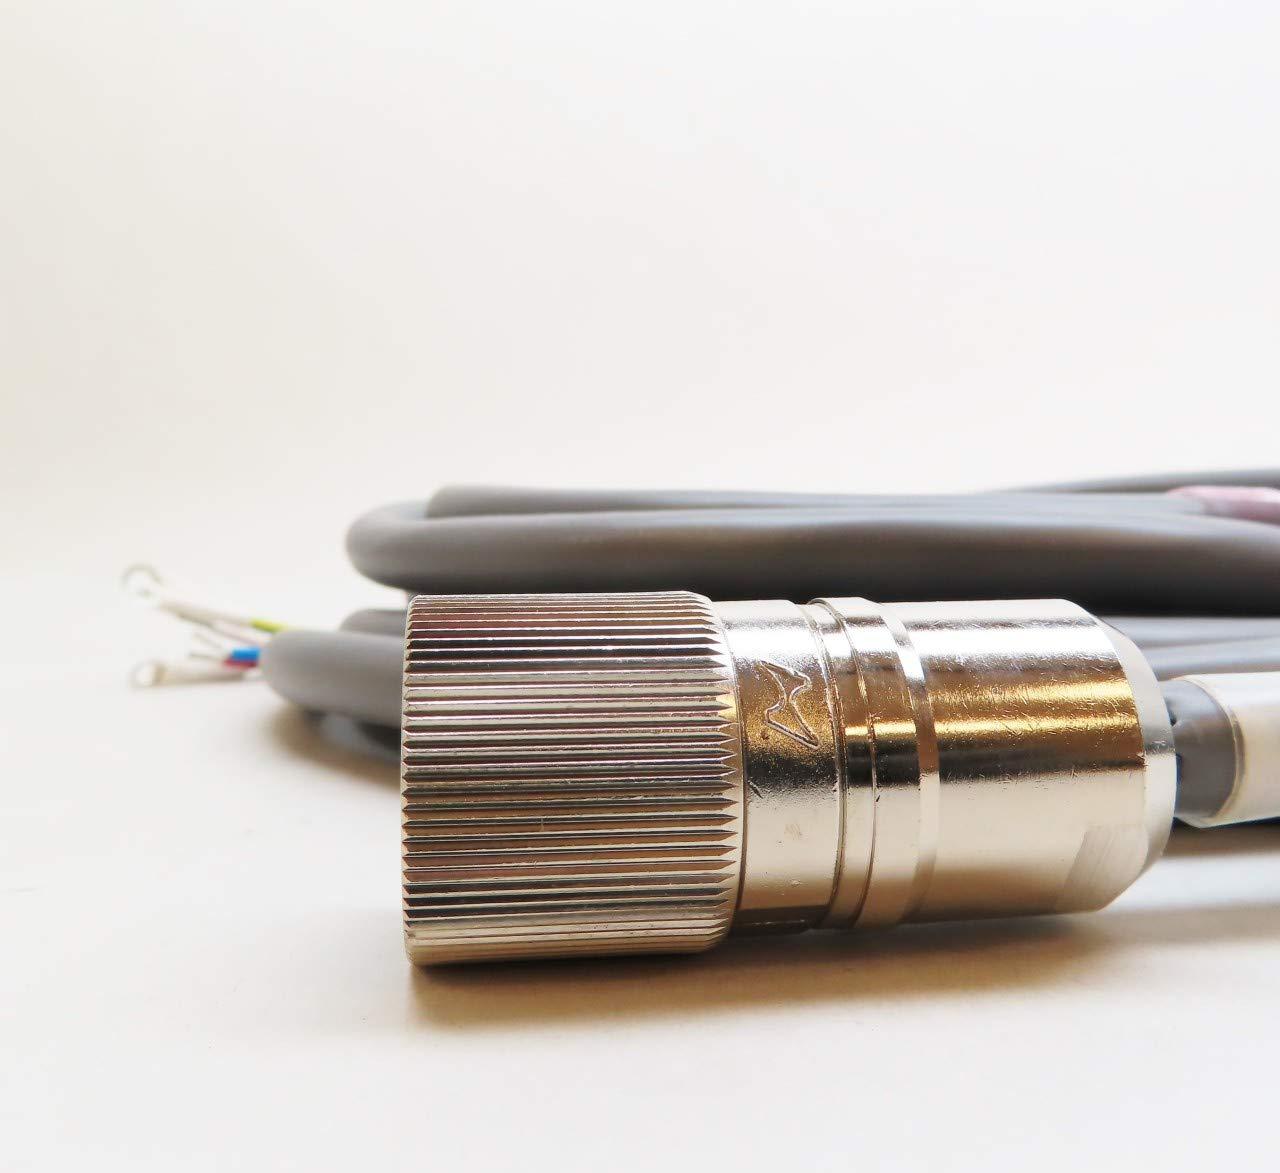 YASKAWA B4IBCE-05 Power Cable REV 4 197IN